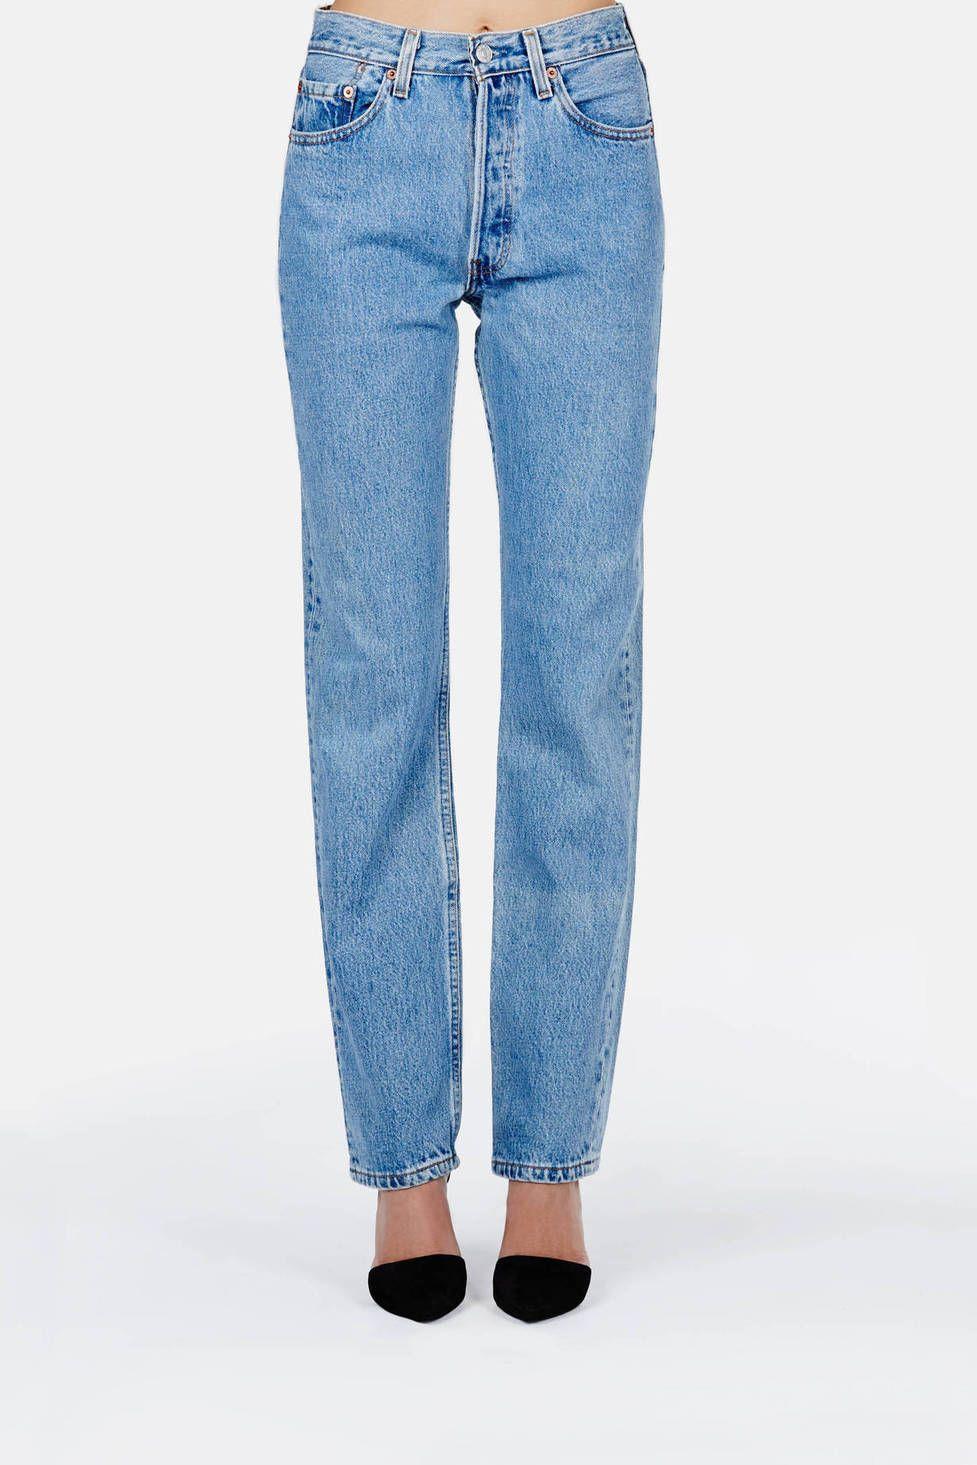 Vintage Boyfriend Jeans   Boyfriend jeans, Shops and Models